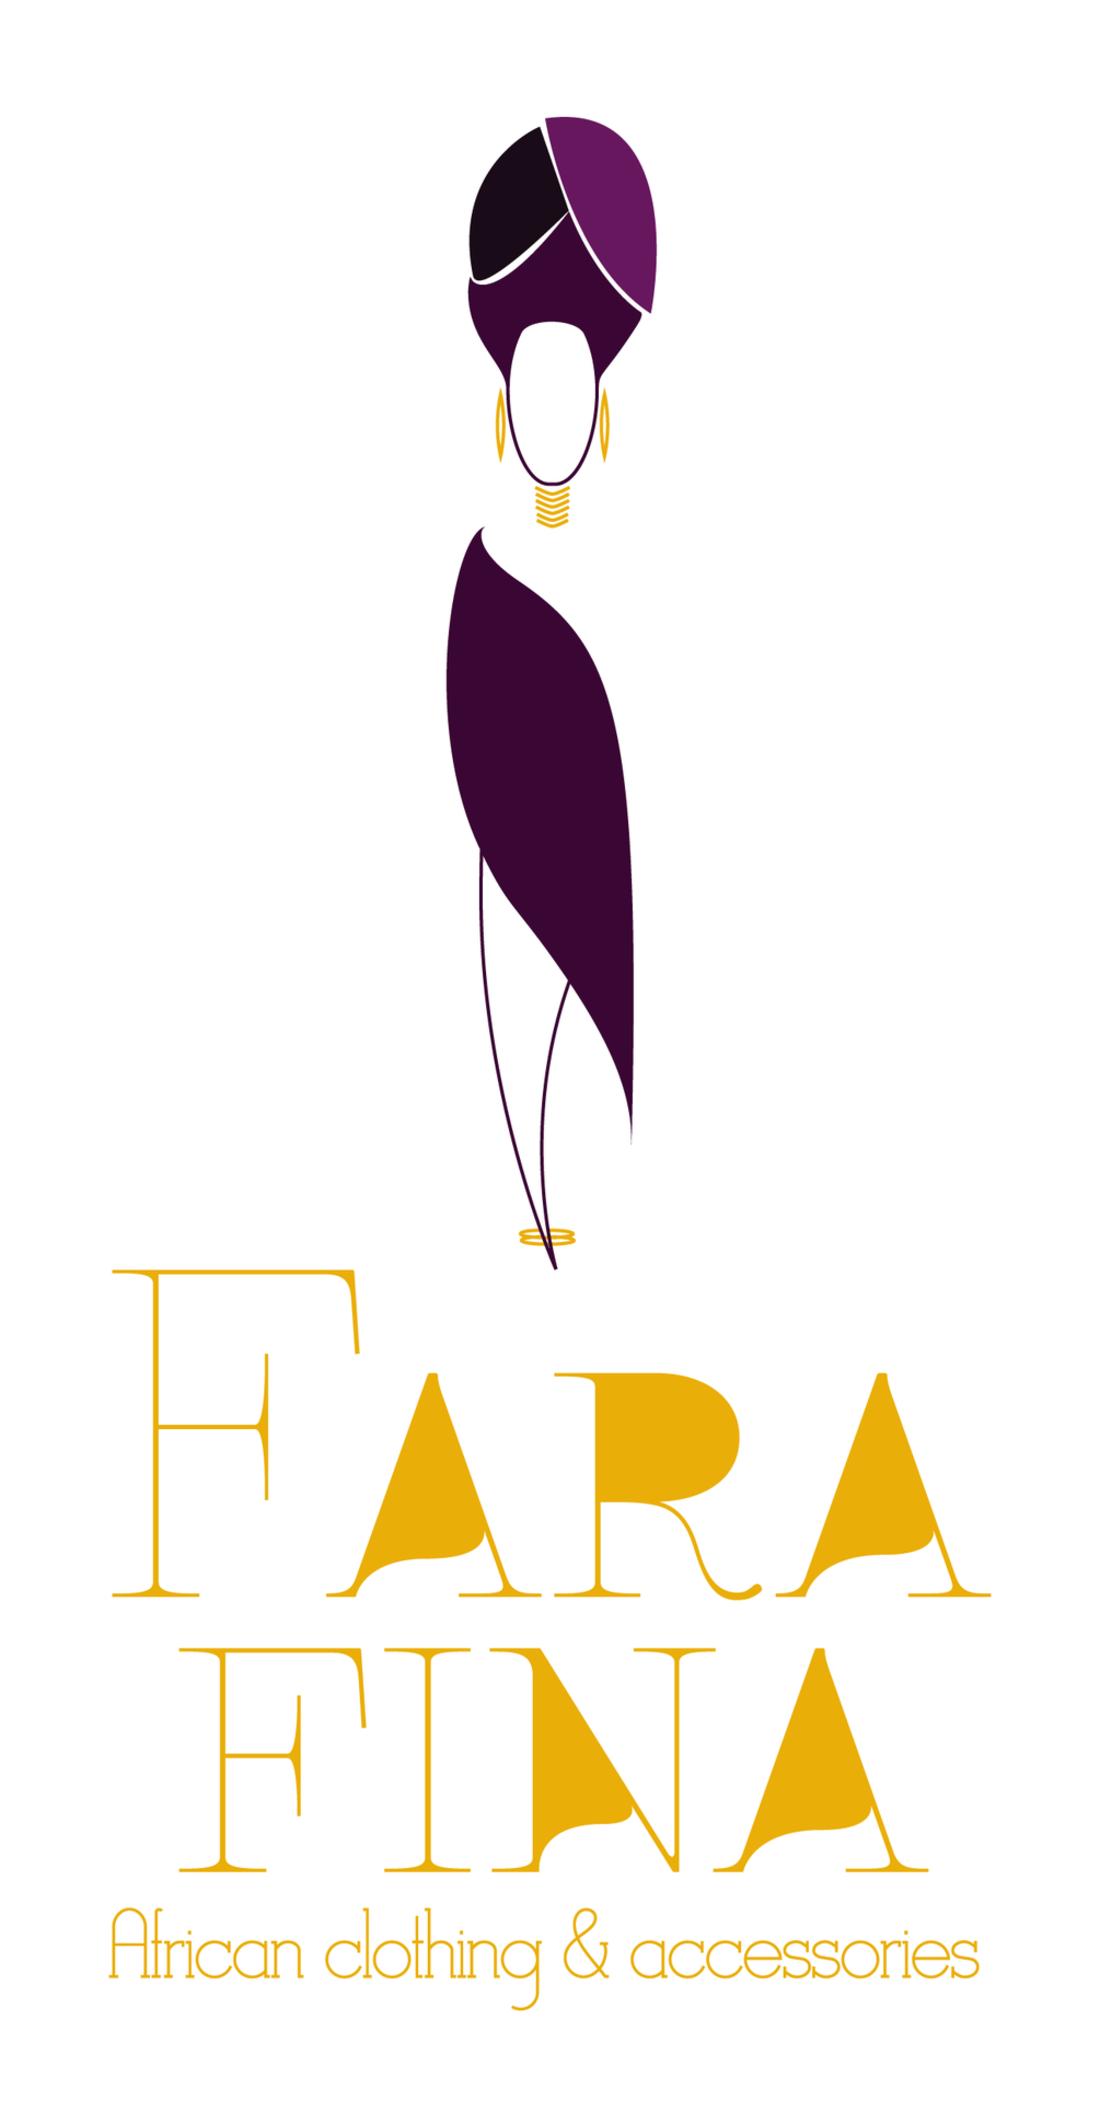 Fatumata Camara - FARAFINA. African clothing & accessories